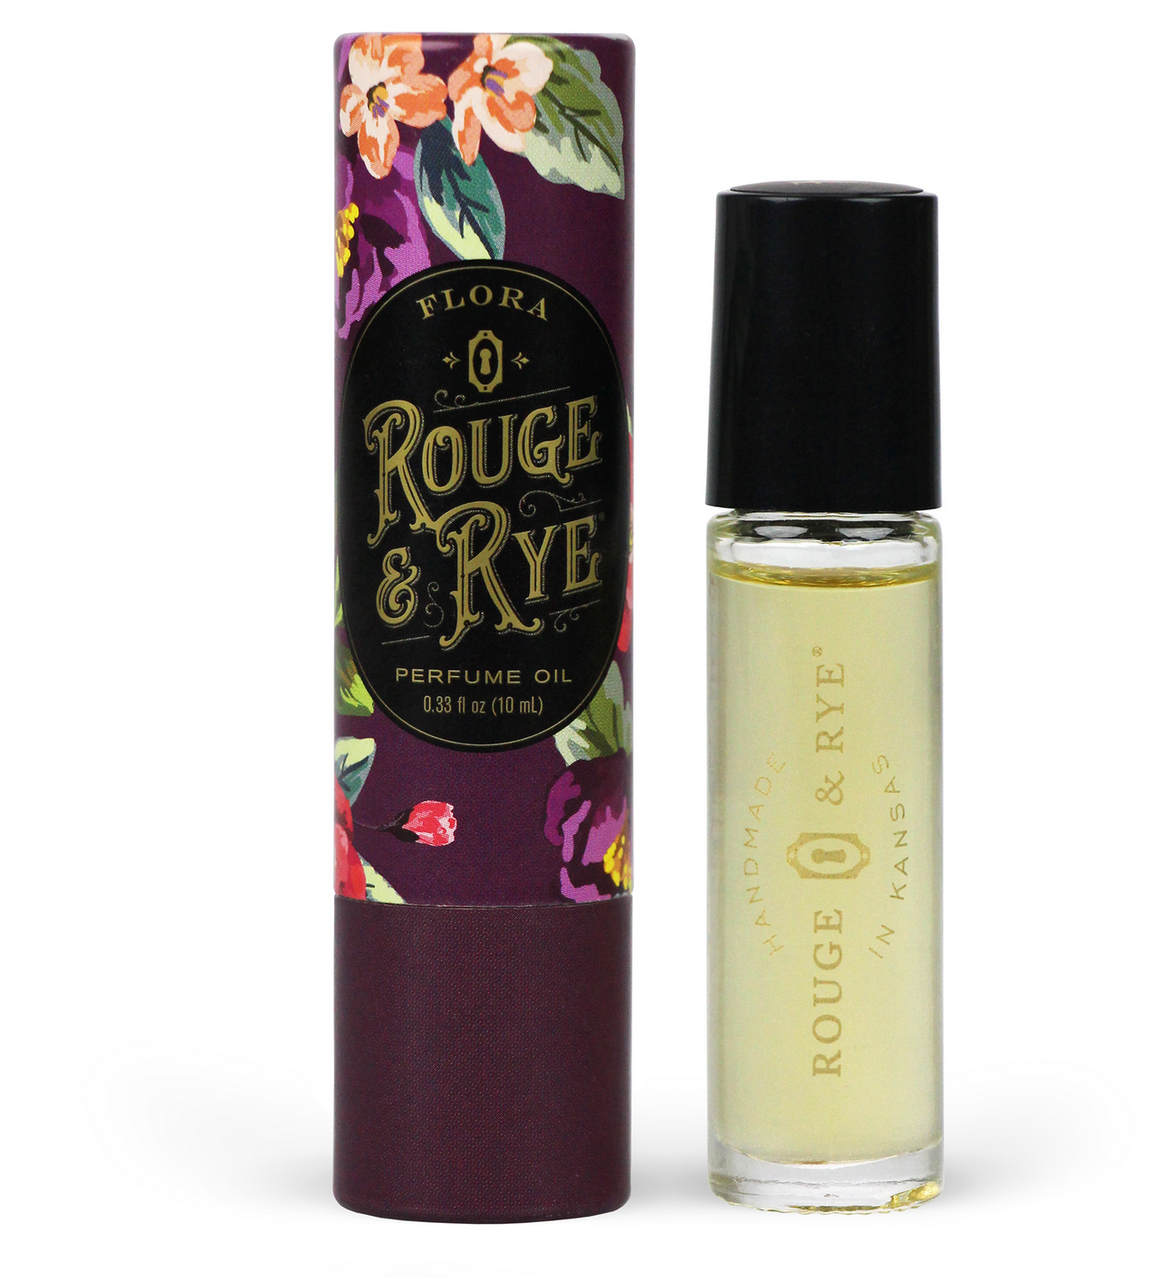 Rouge & Rye Flora Perfume-Pomegranate, Bergamot and Black Tea